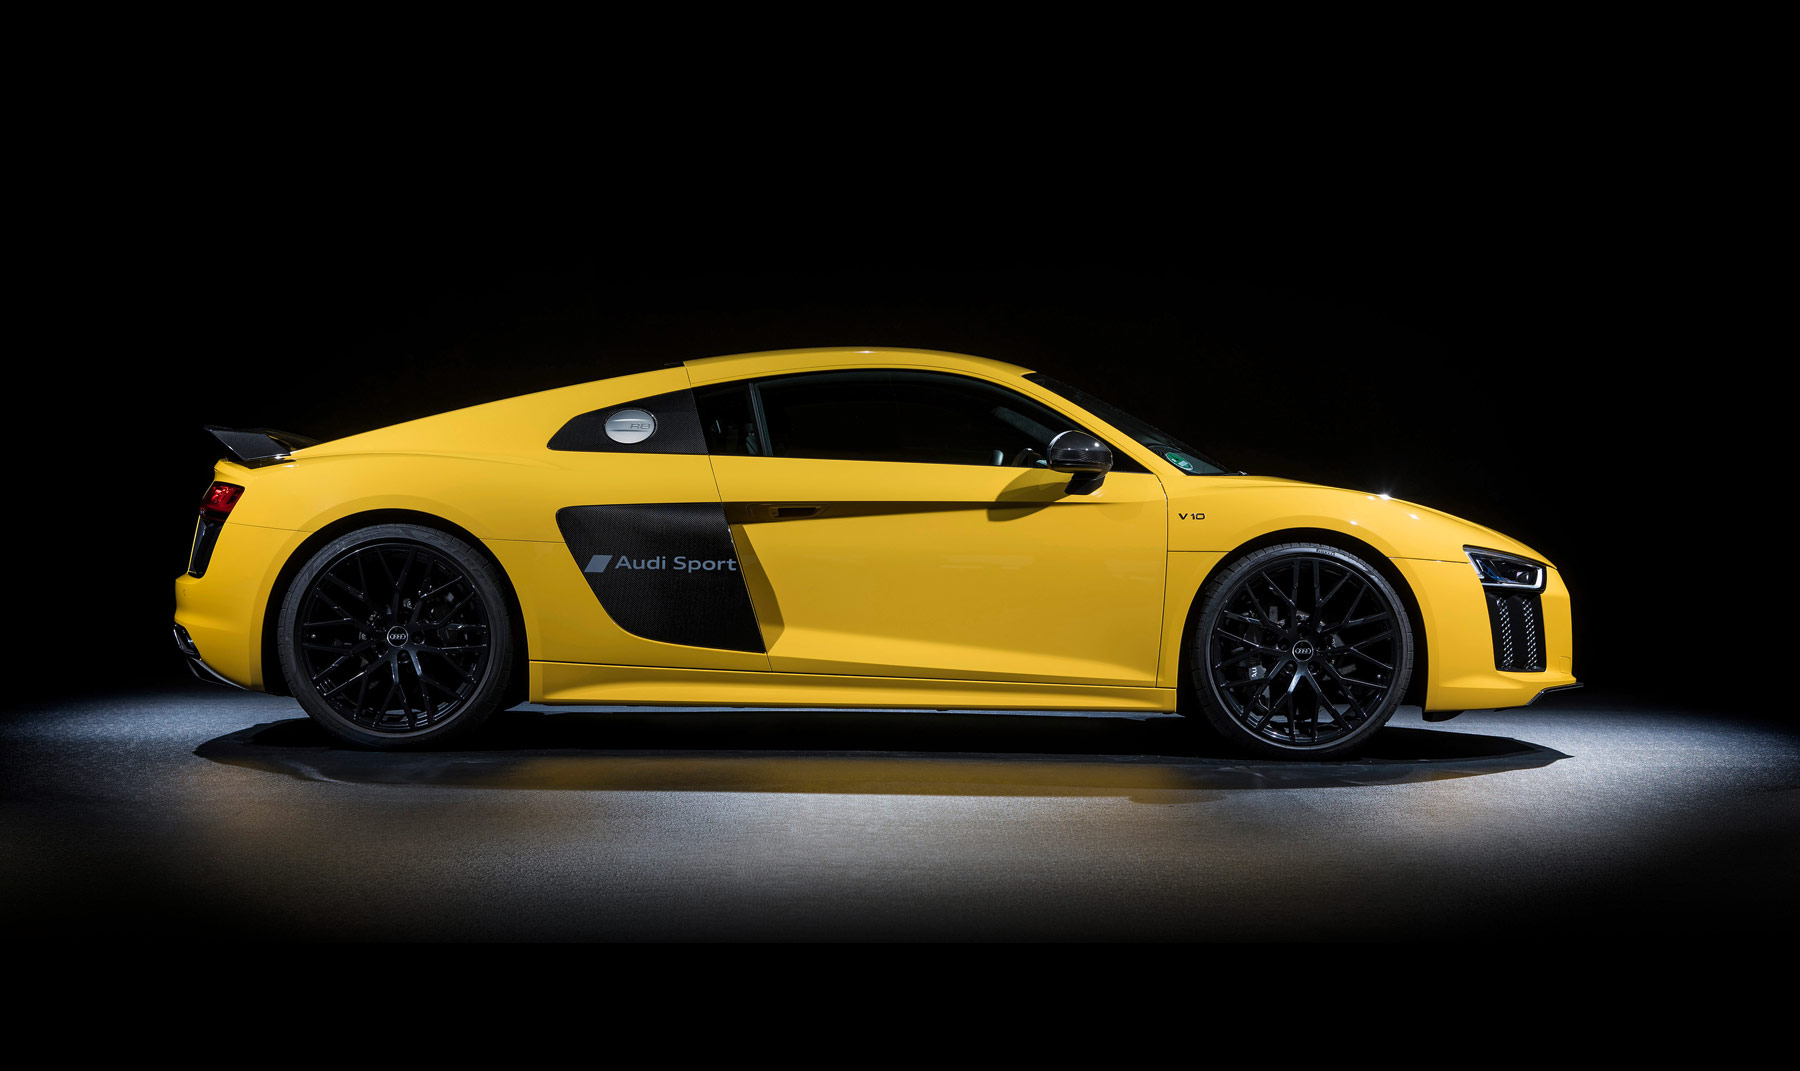 Audi's R8 Supercar Gets New Sideblade Script Option